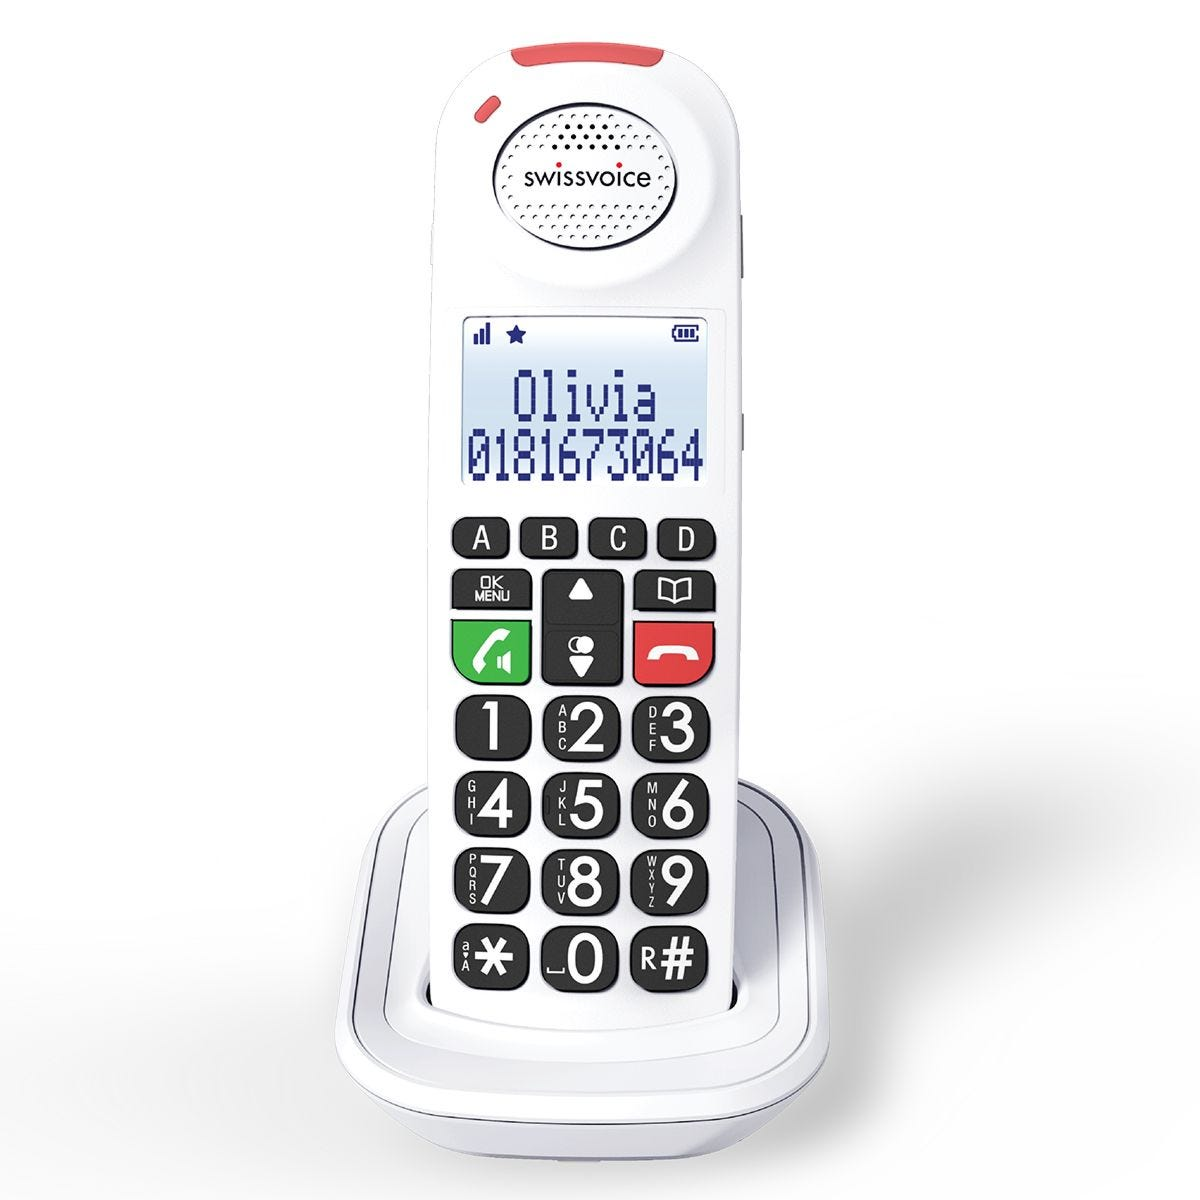 Swissvoice Xtra Handset 8155 Phone with Base